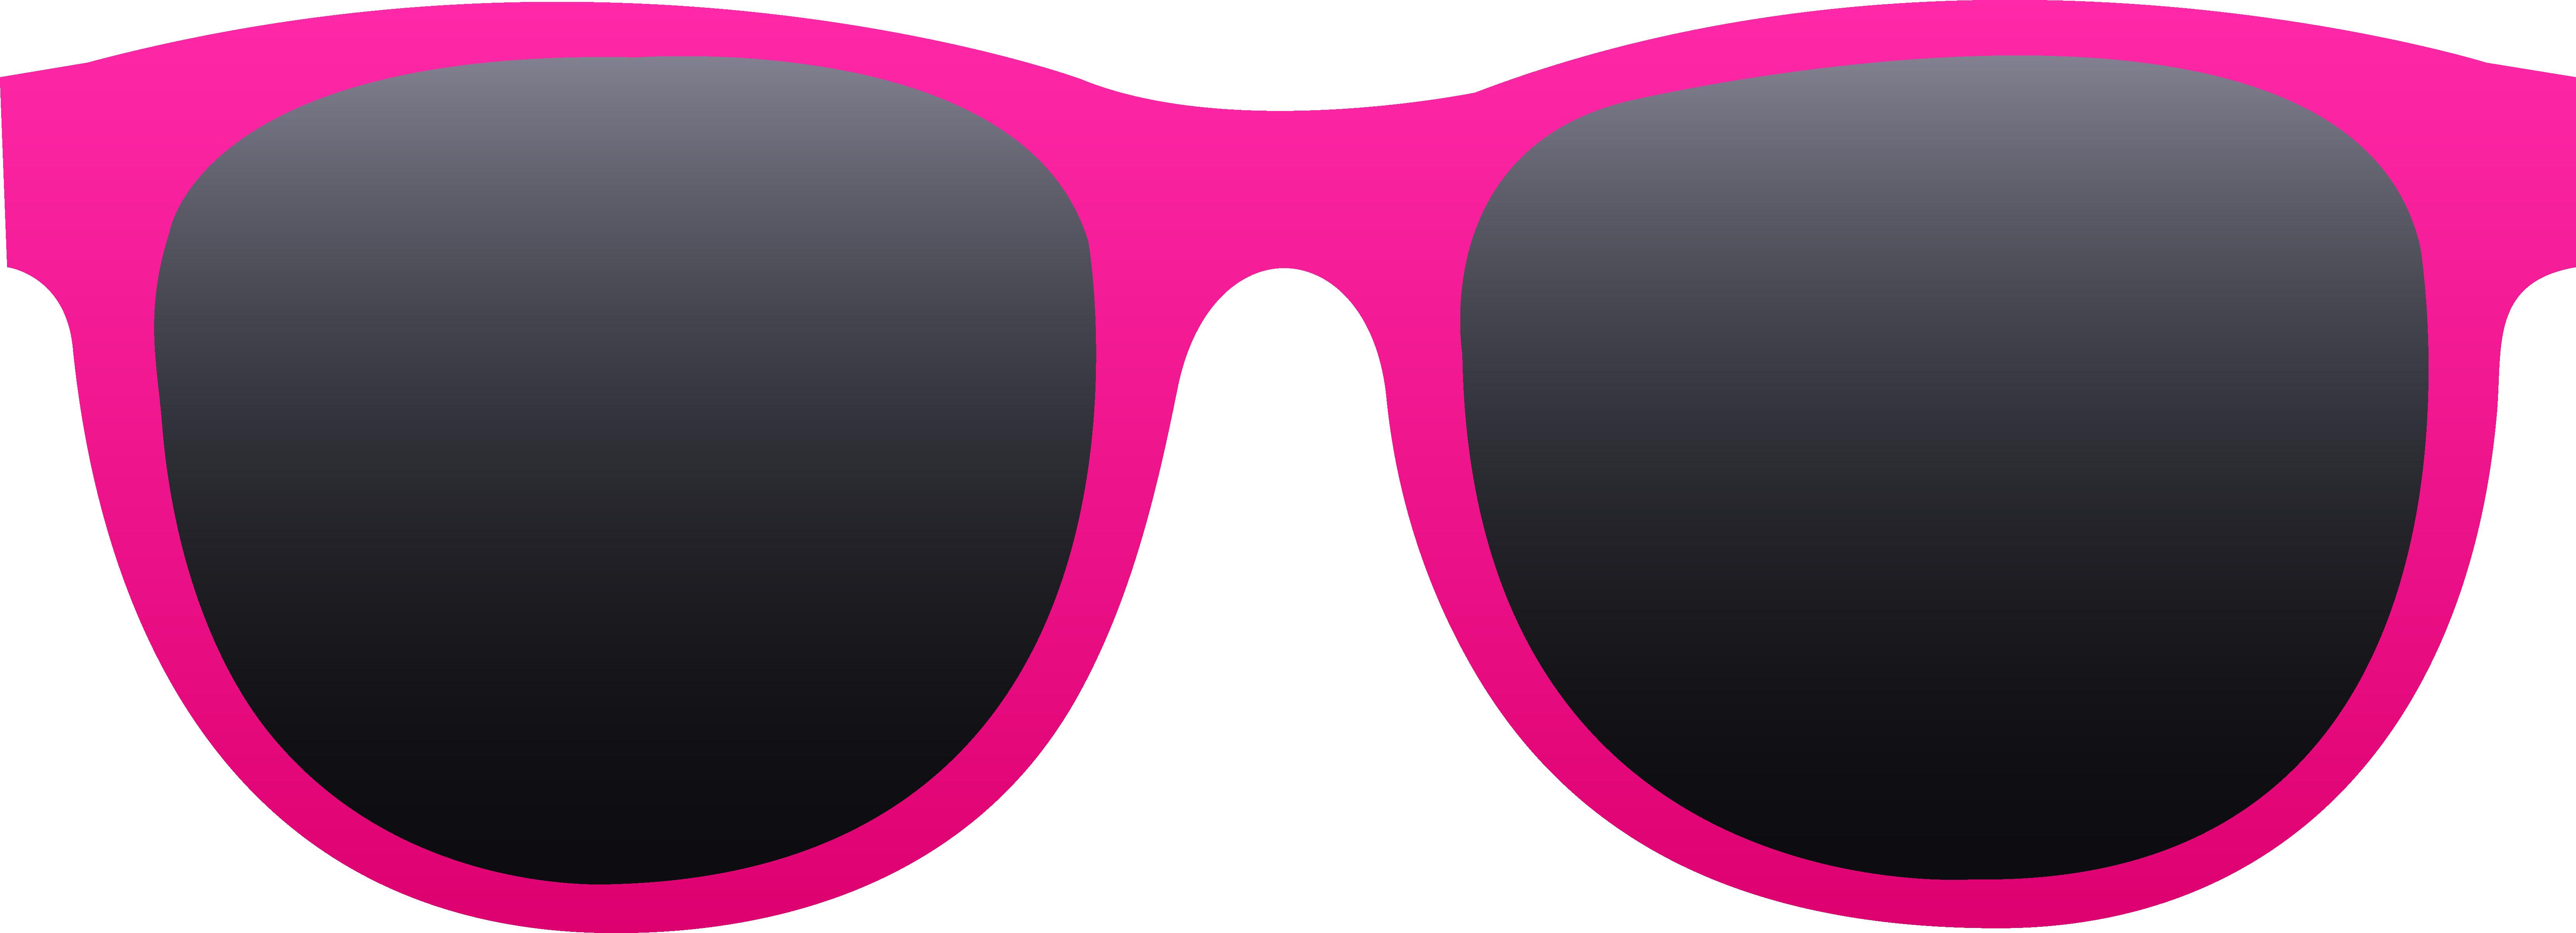 6638x2404 80s Clip Art Sunglasses 80s Sunglasses Alihkan.us